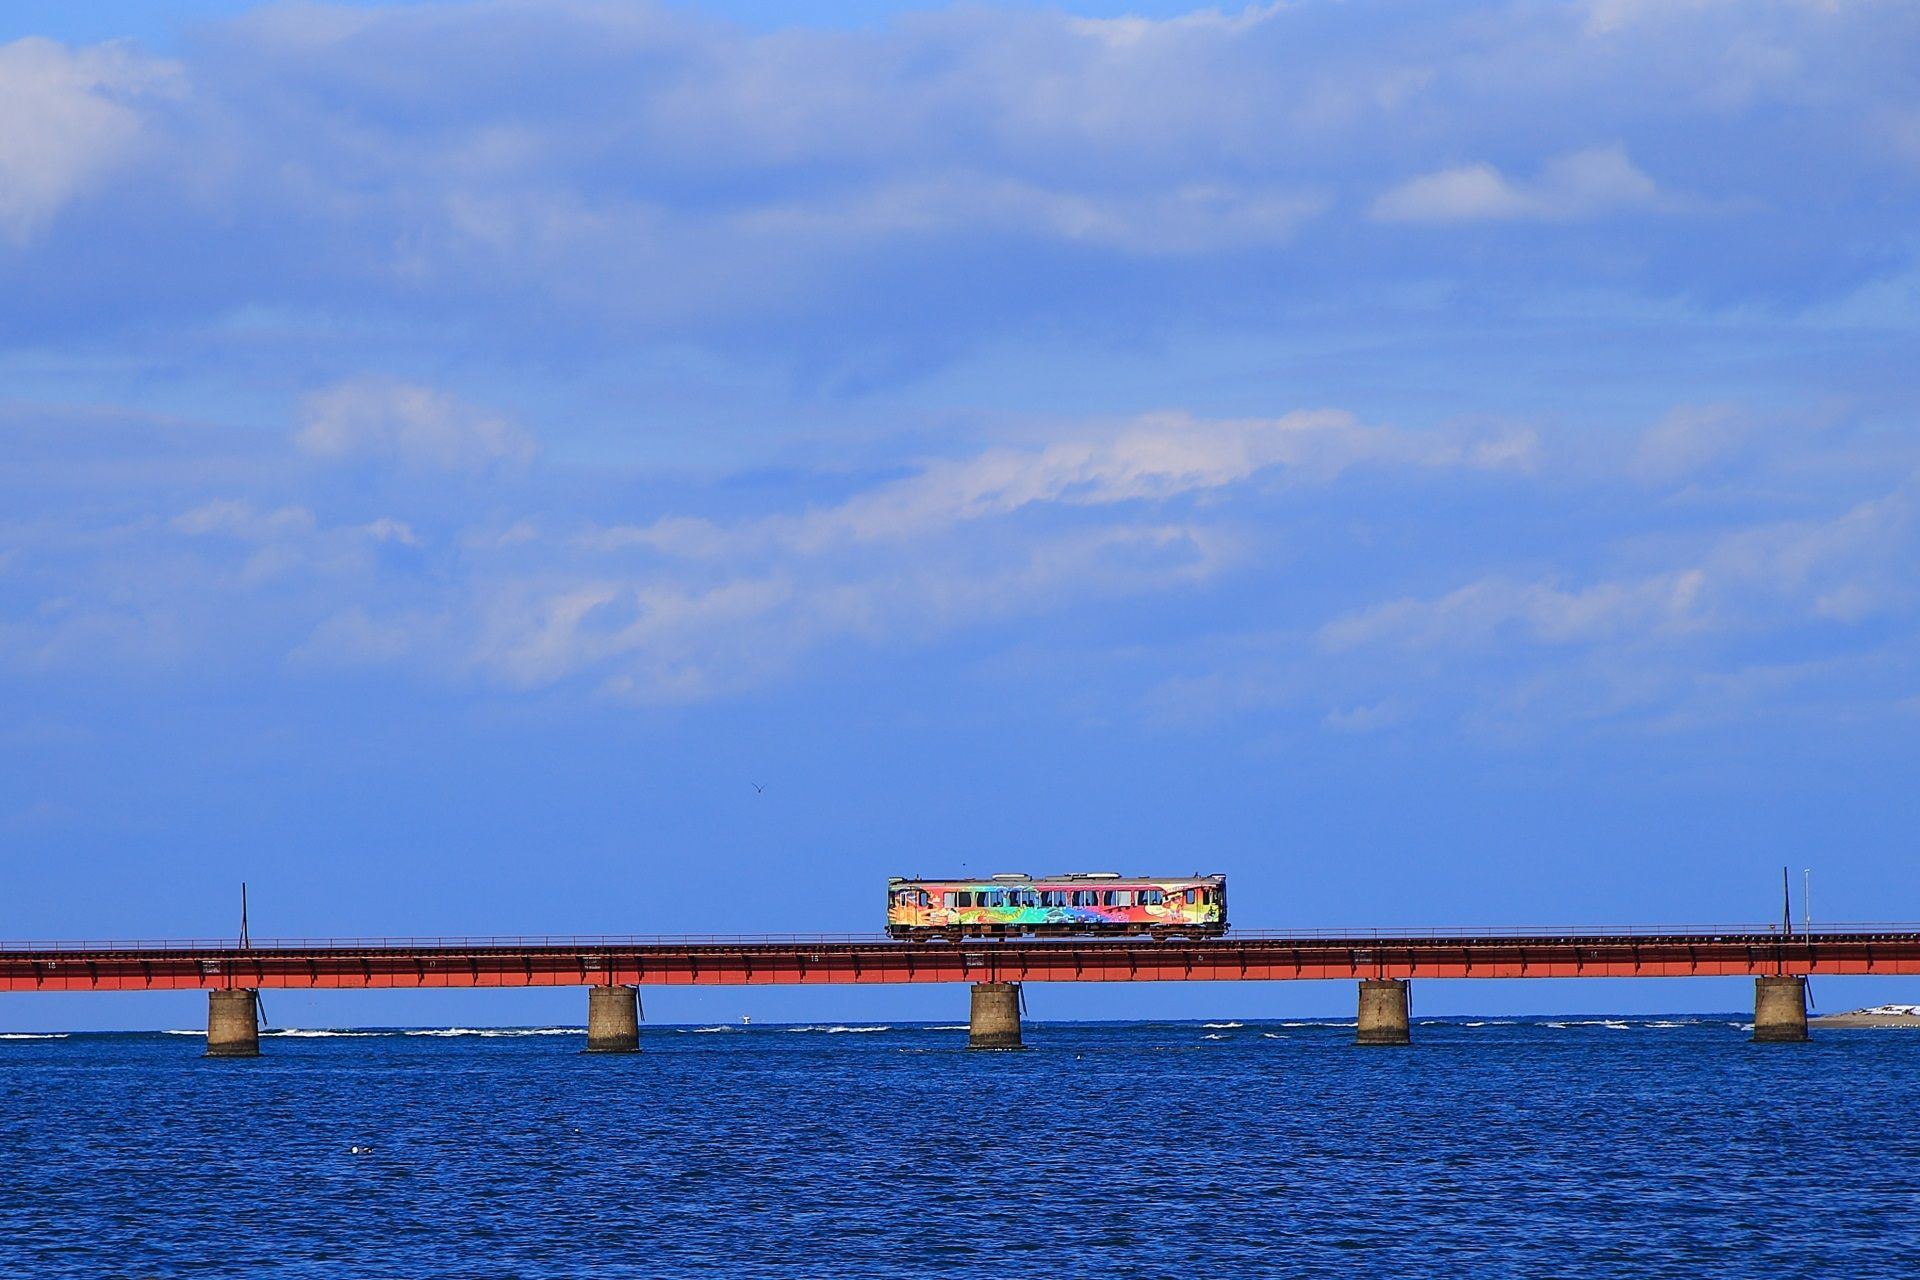 海の上を走る電車の由良川橋梁の京都丹後鉄道 京都 電車 日本旅行